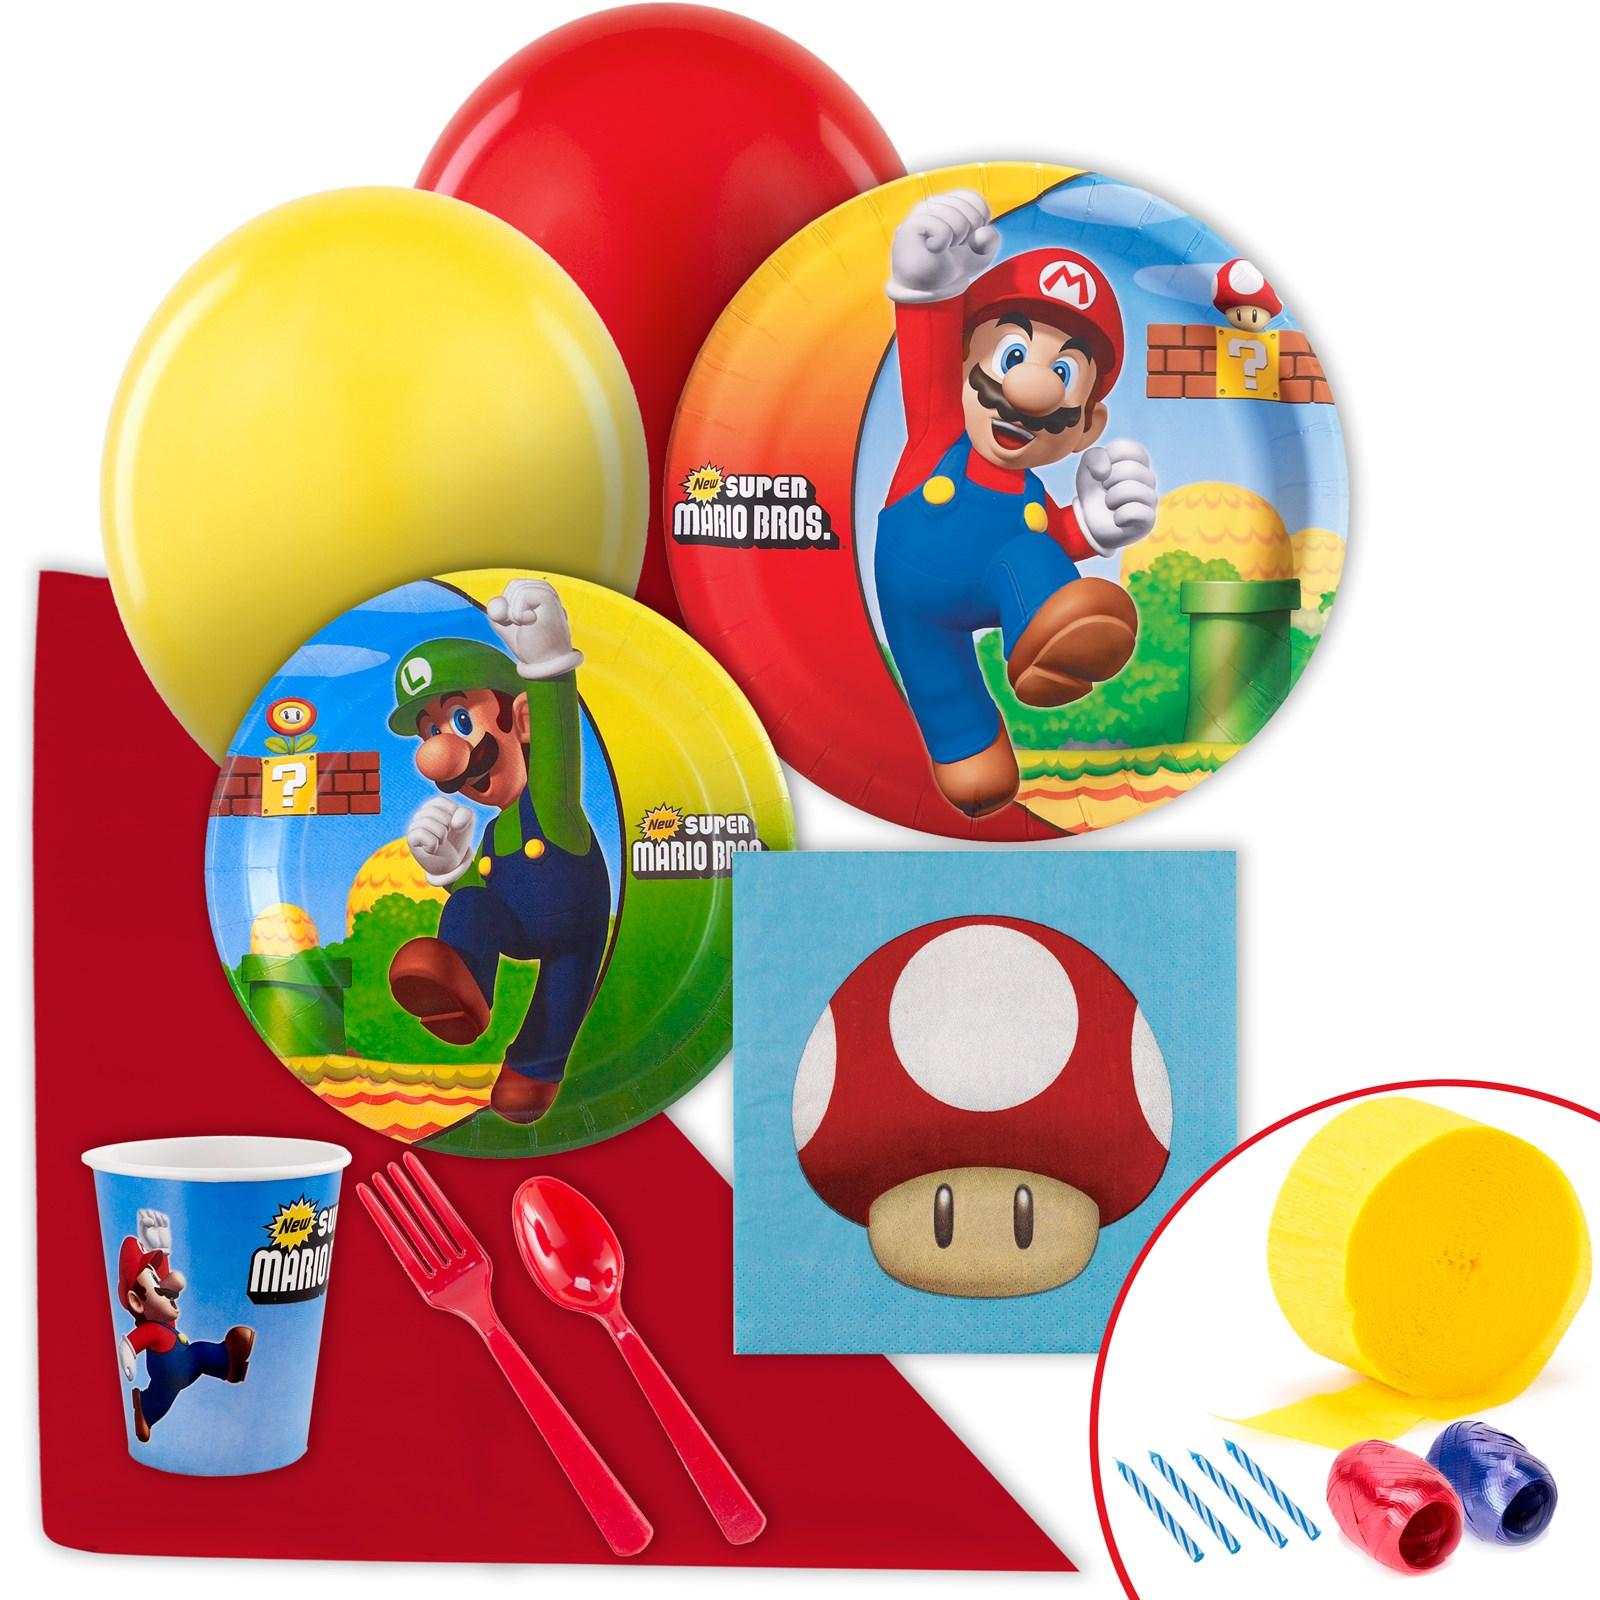 Super Mario Bros. Value Party Pack kids birthday partyware